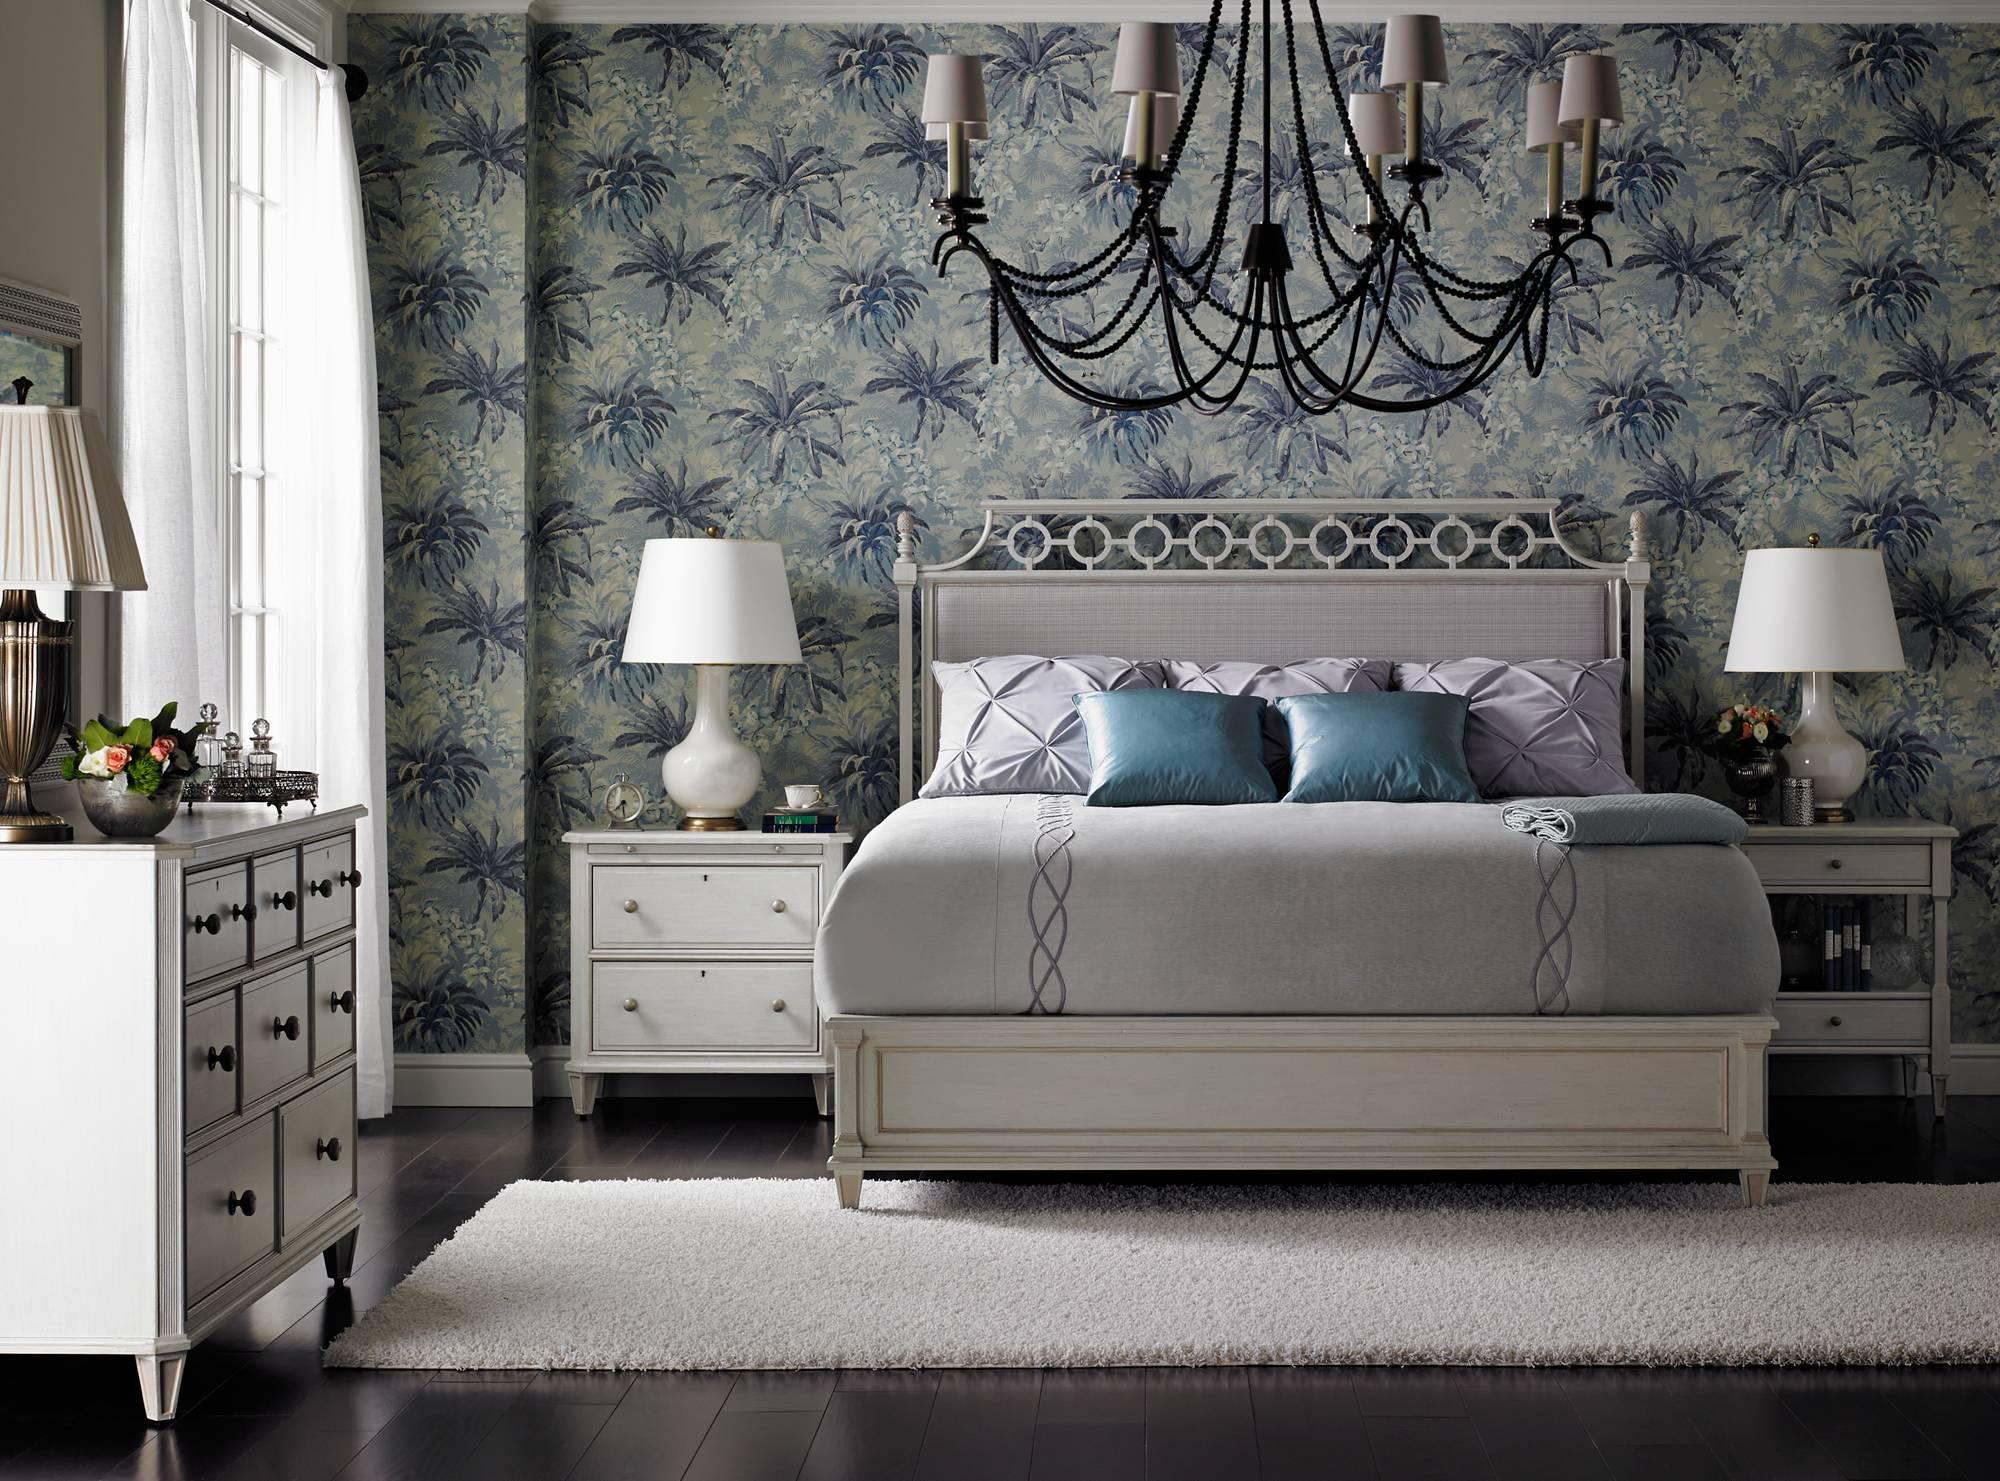 Stanley Furniture Preserve California King Bedroom Group - Item Number: 340-2 CK Bedroom Group 1